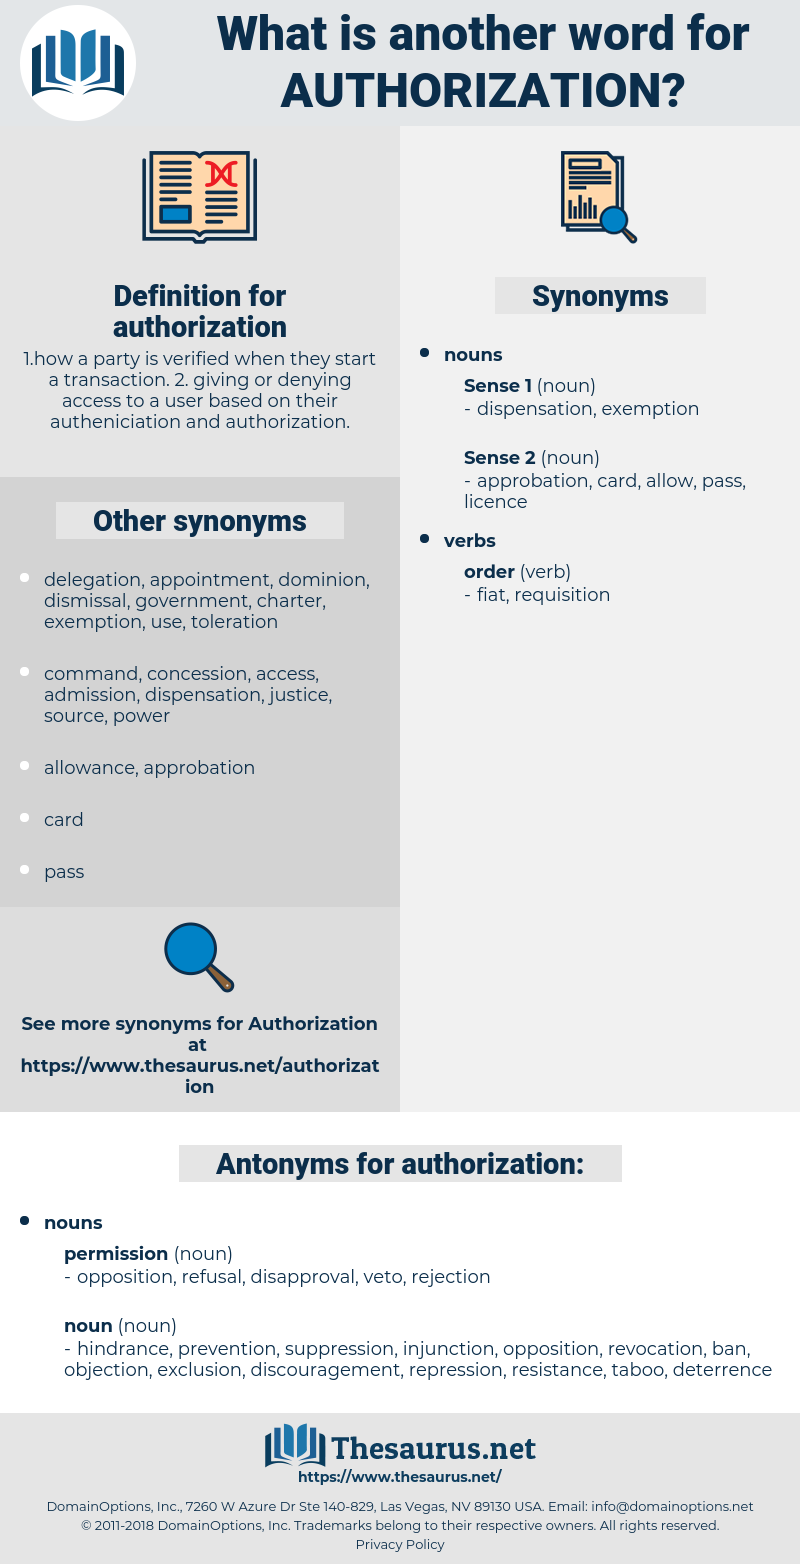 authorization, synonym authorization, another word for authorization, words like authorization, thesaurus authorization